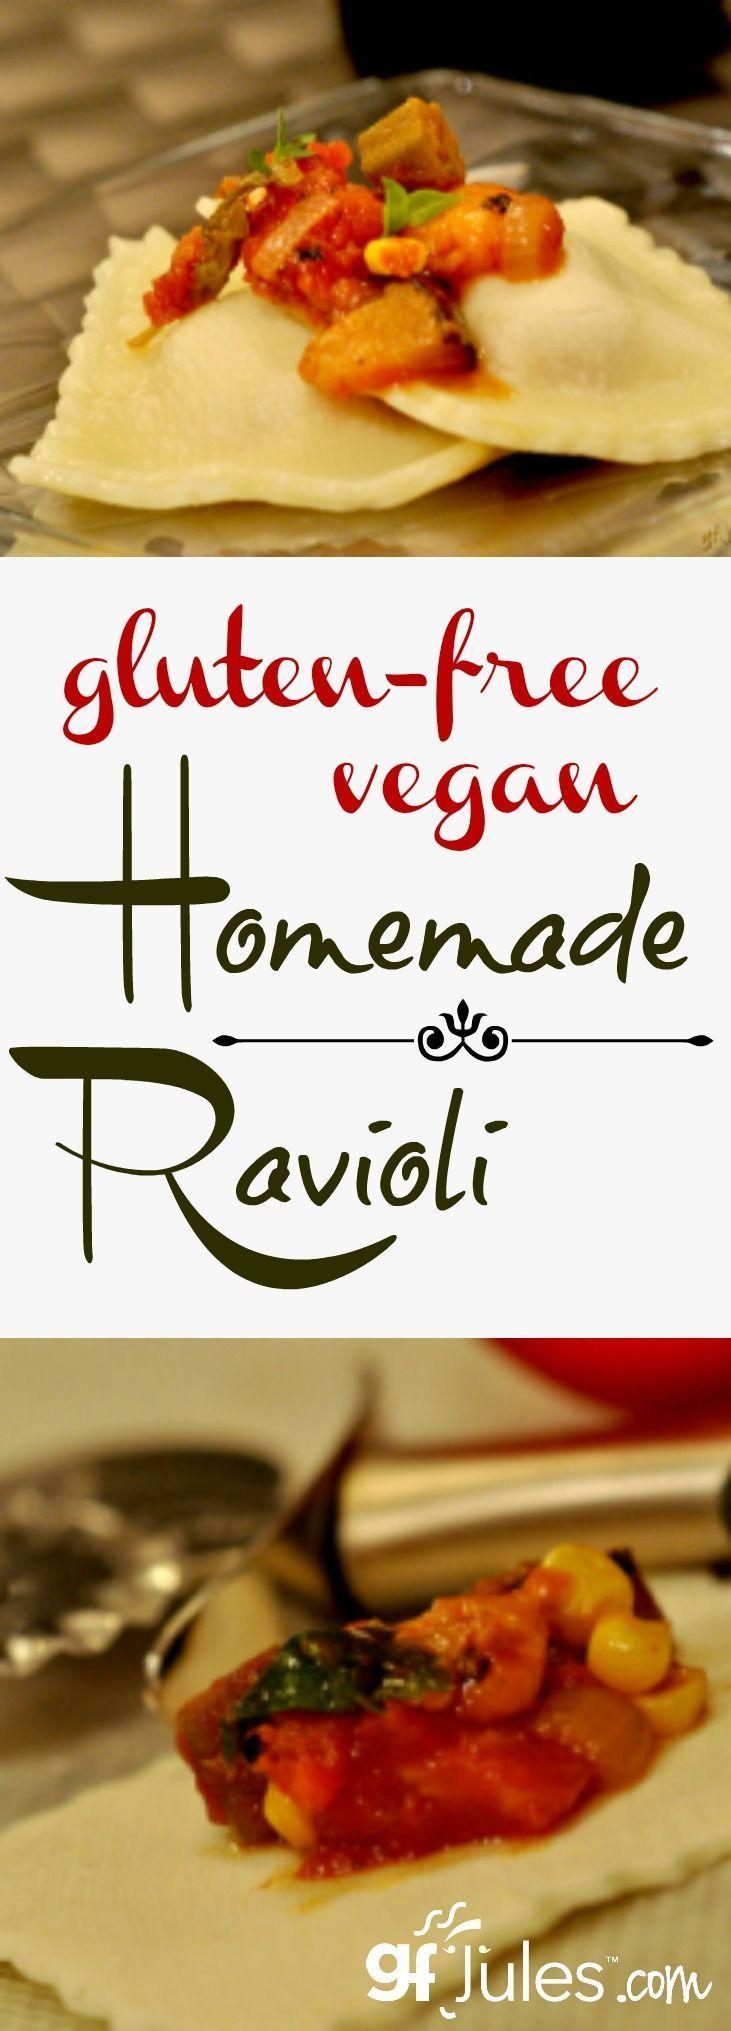 Easy Gluten Free Ravioli or Tortellini Easy Free